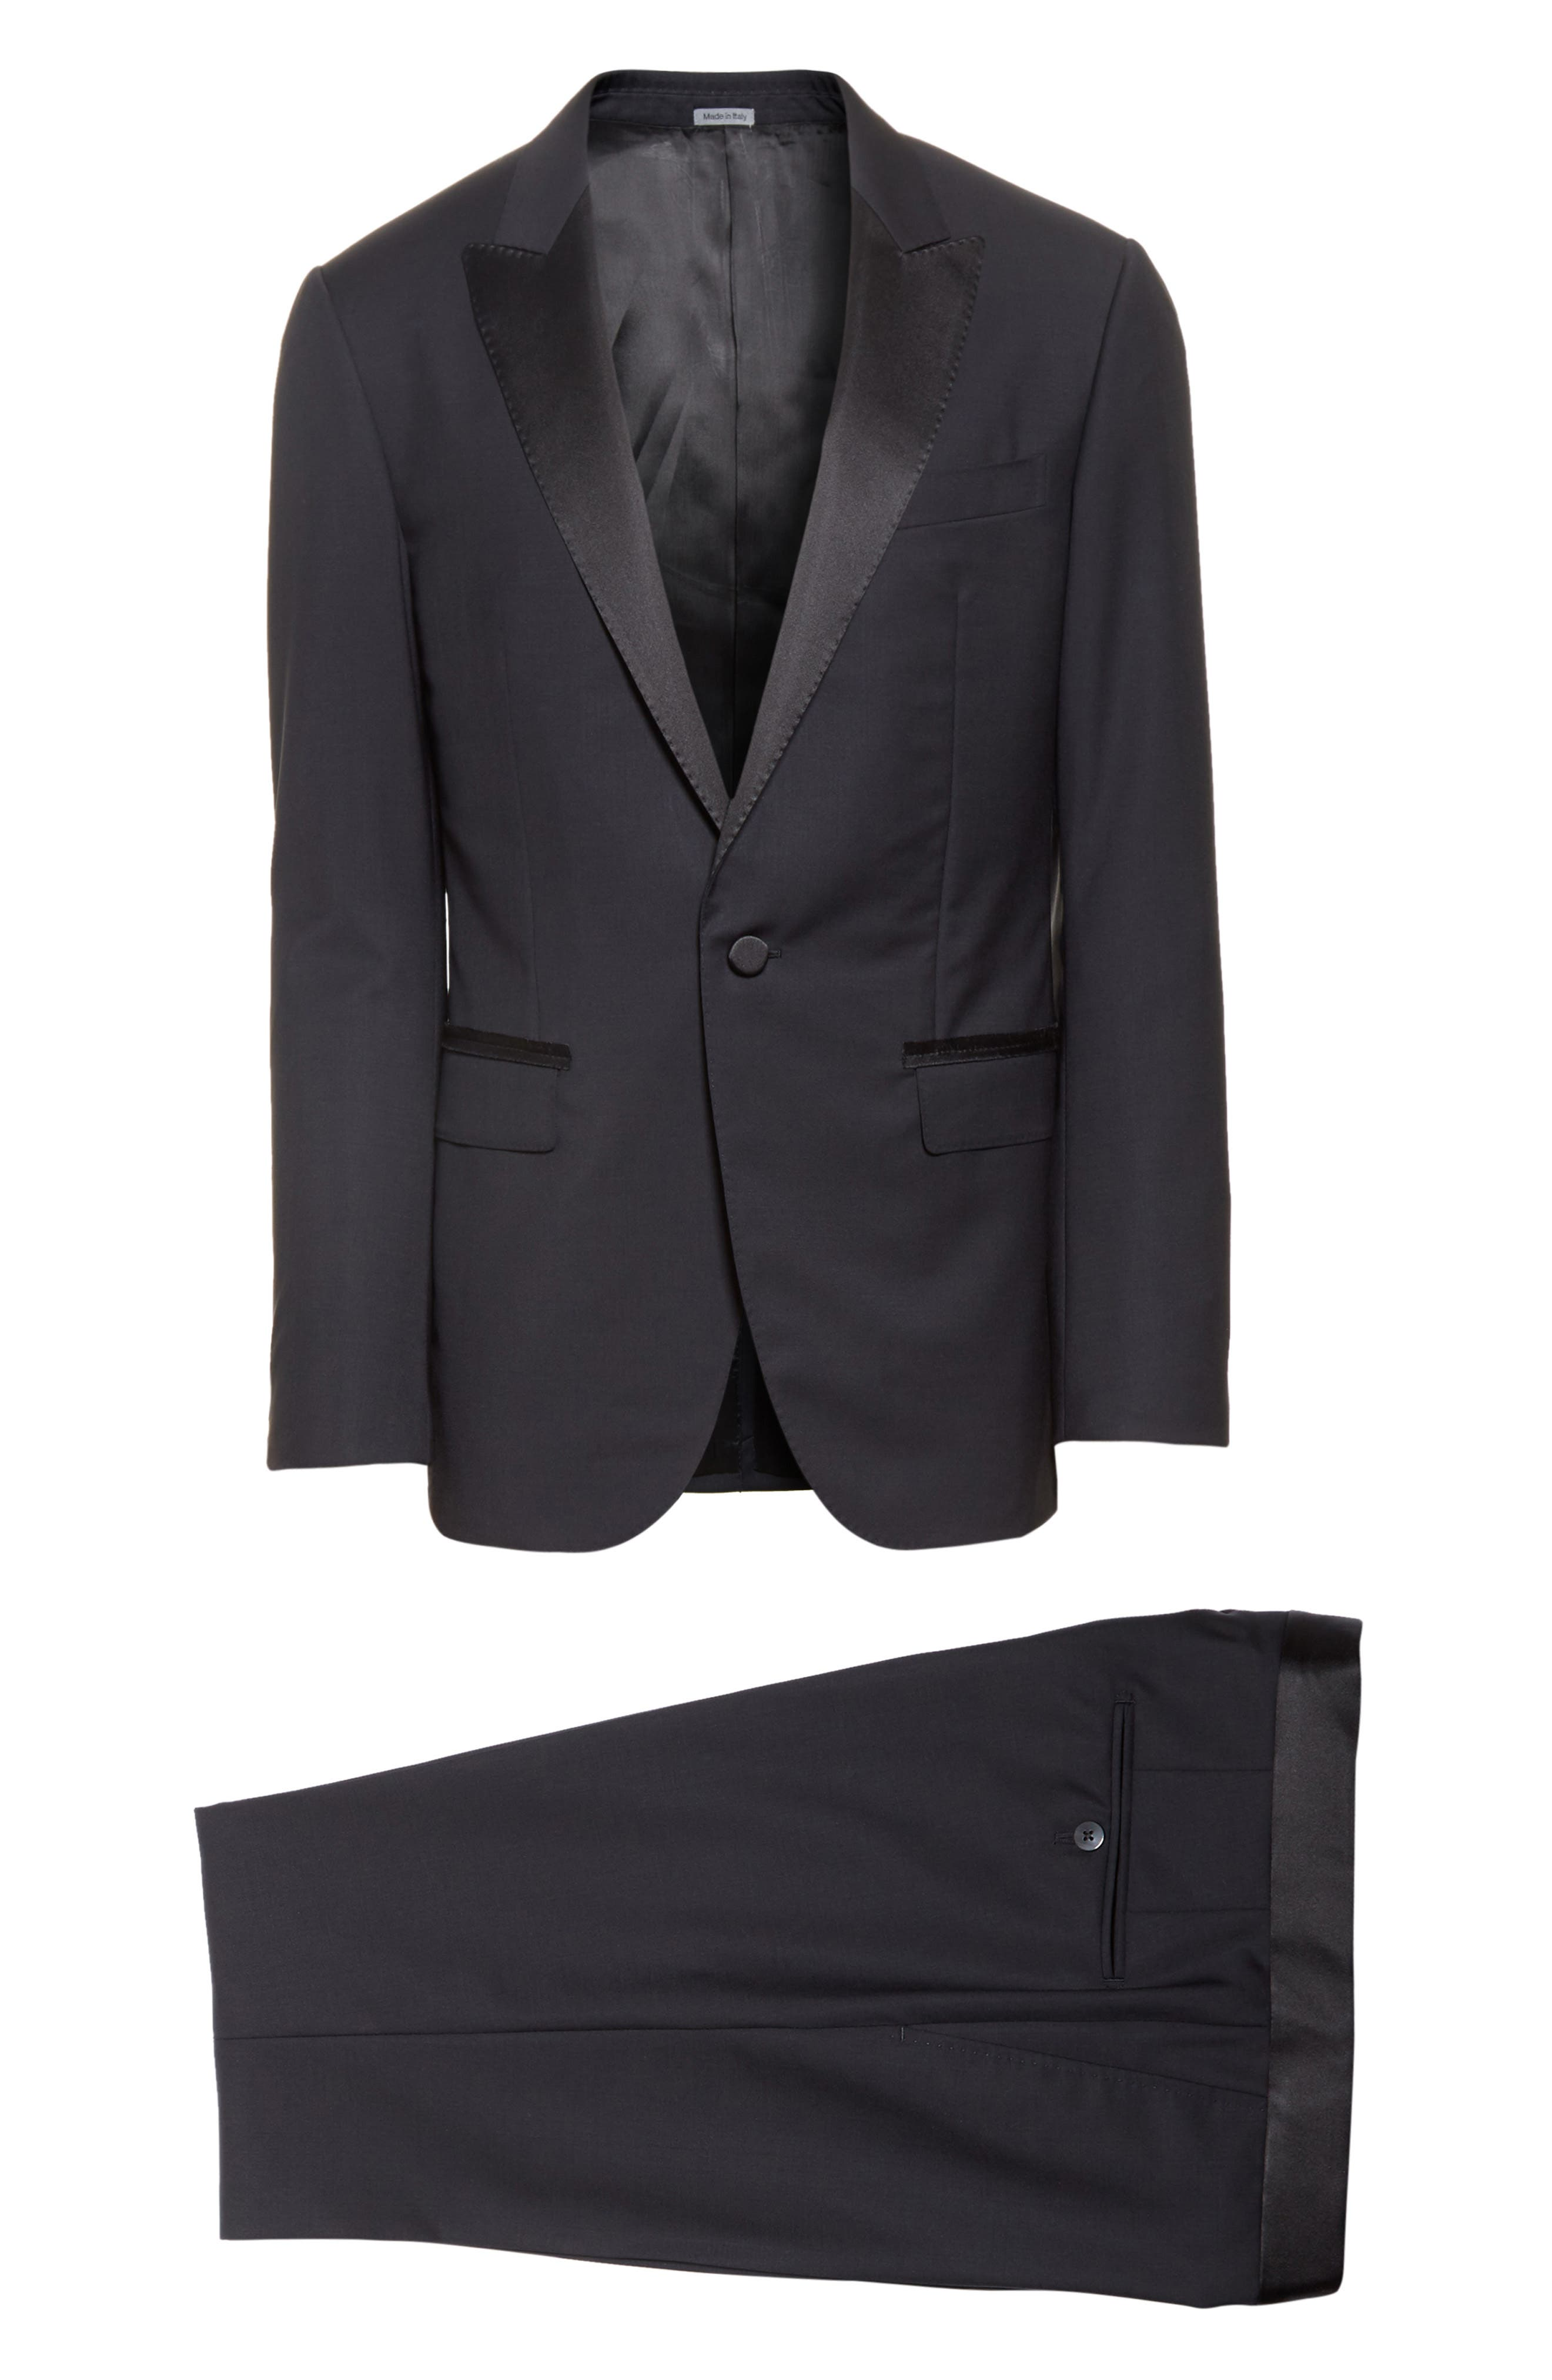 Peak Lapel Wool Blend Tuxedo,                             Alternate thumbnail 8, color,                             Navy